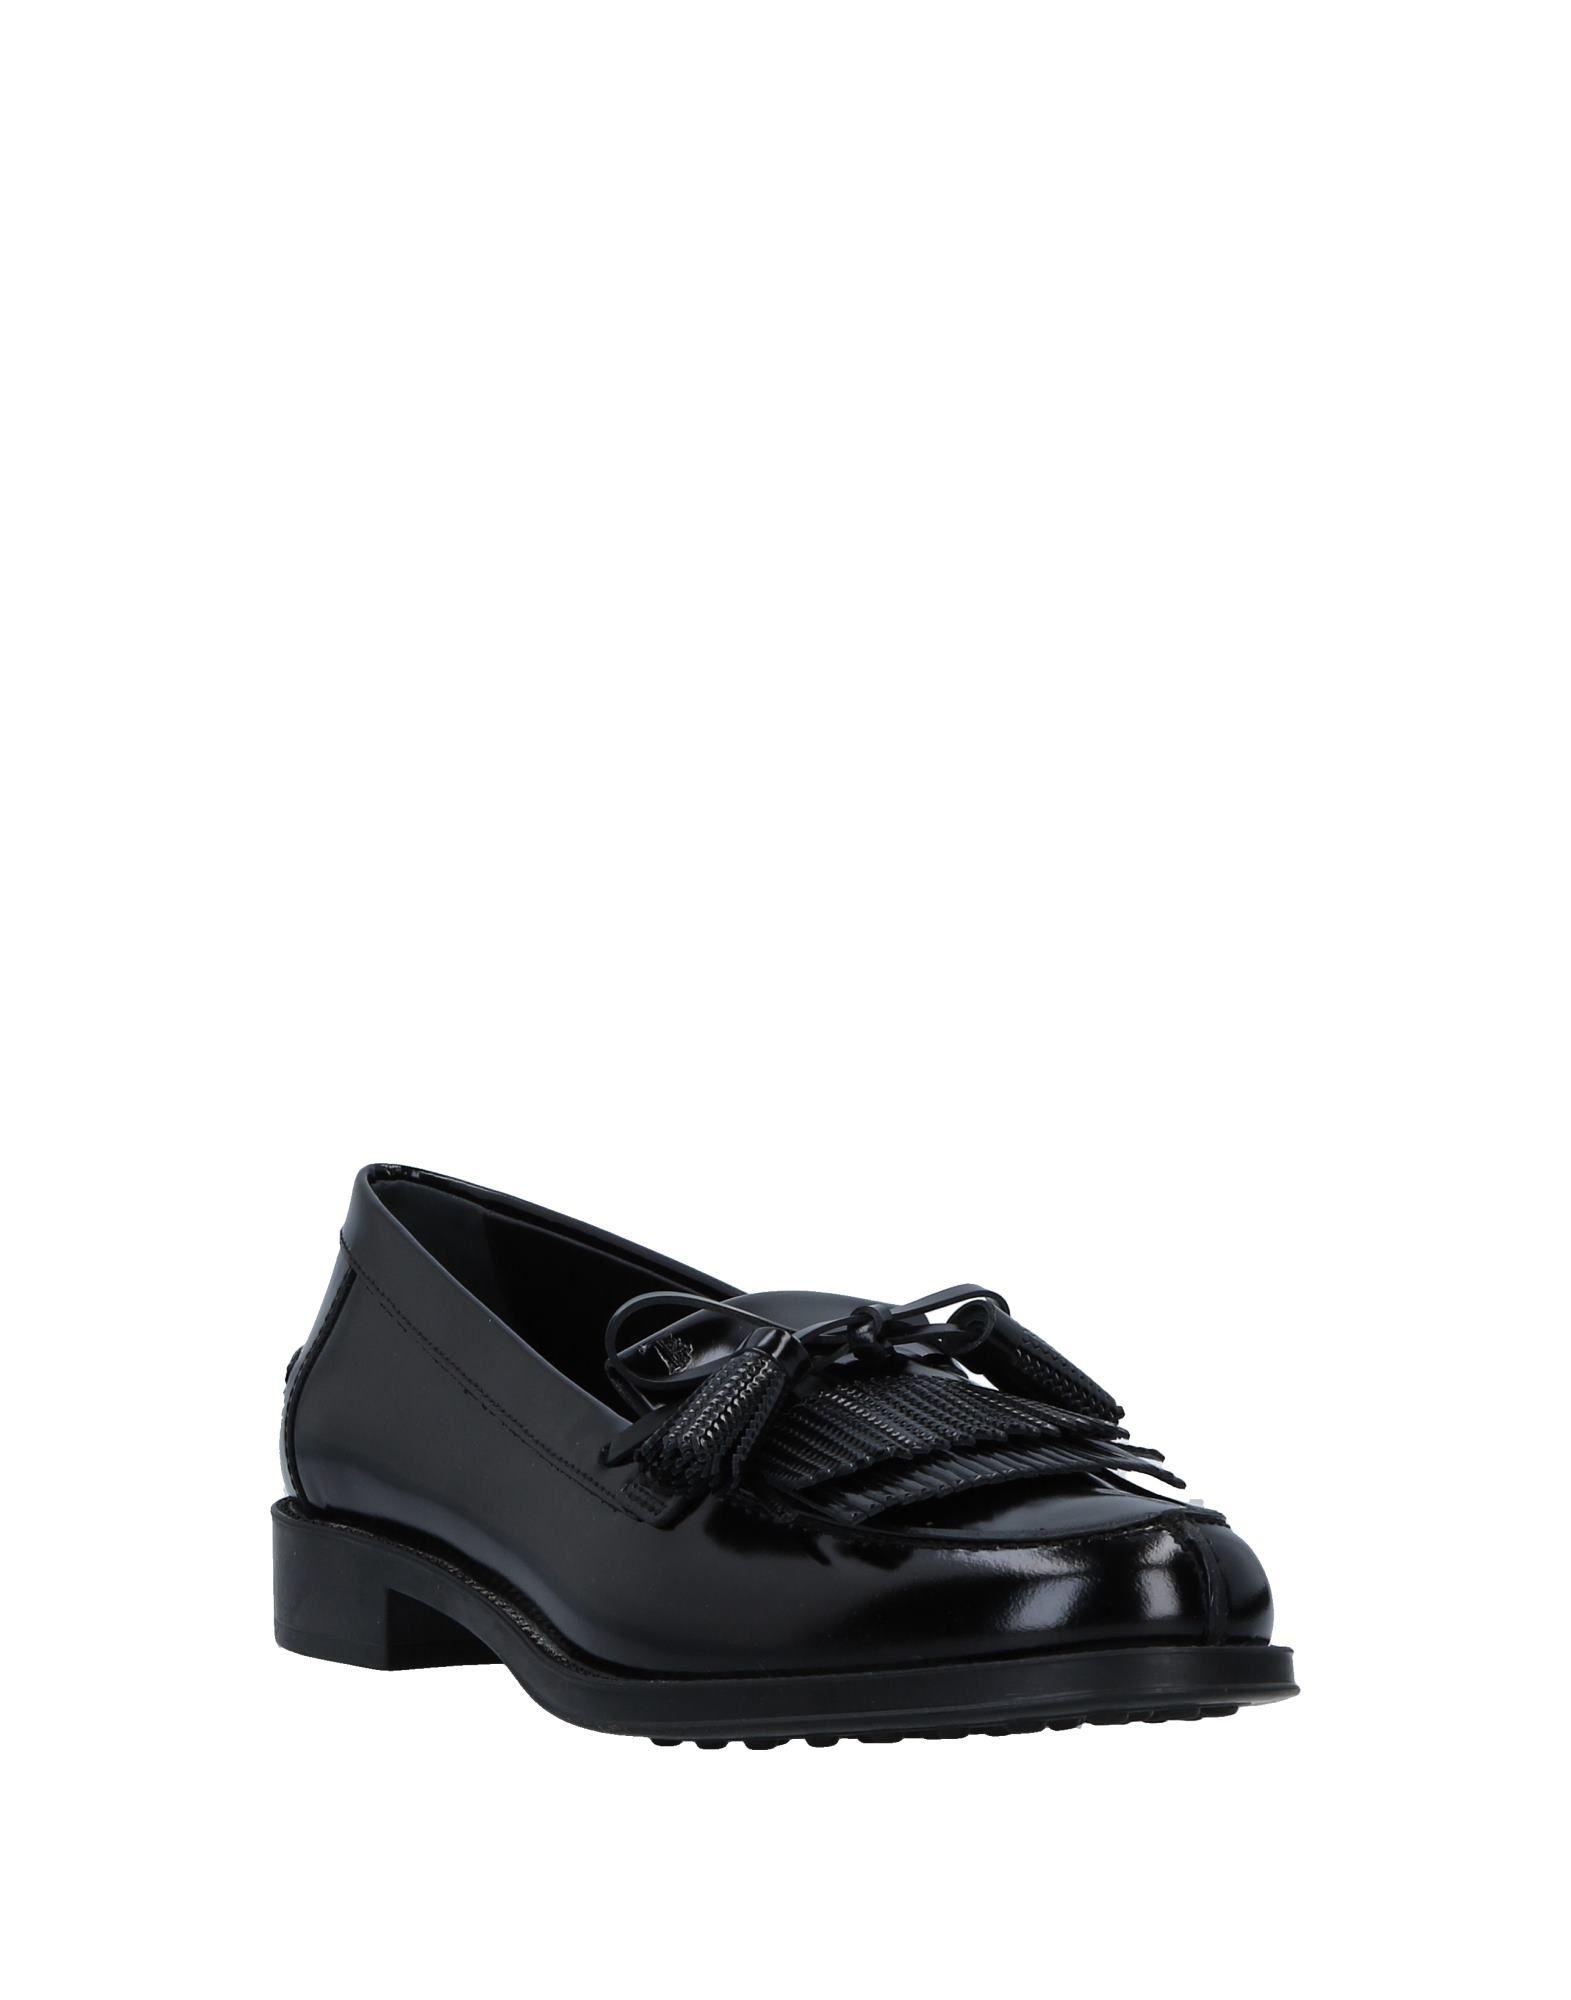 Rabatt  Schuhe Tod's Mokassins Damen  Rabatt 11542424FE dcd23b